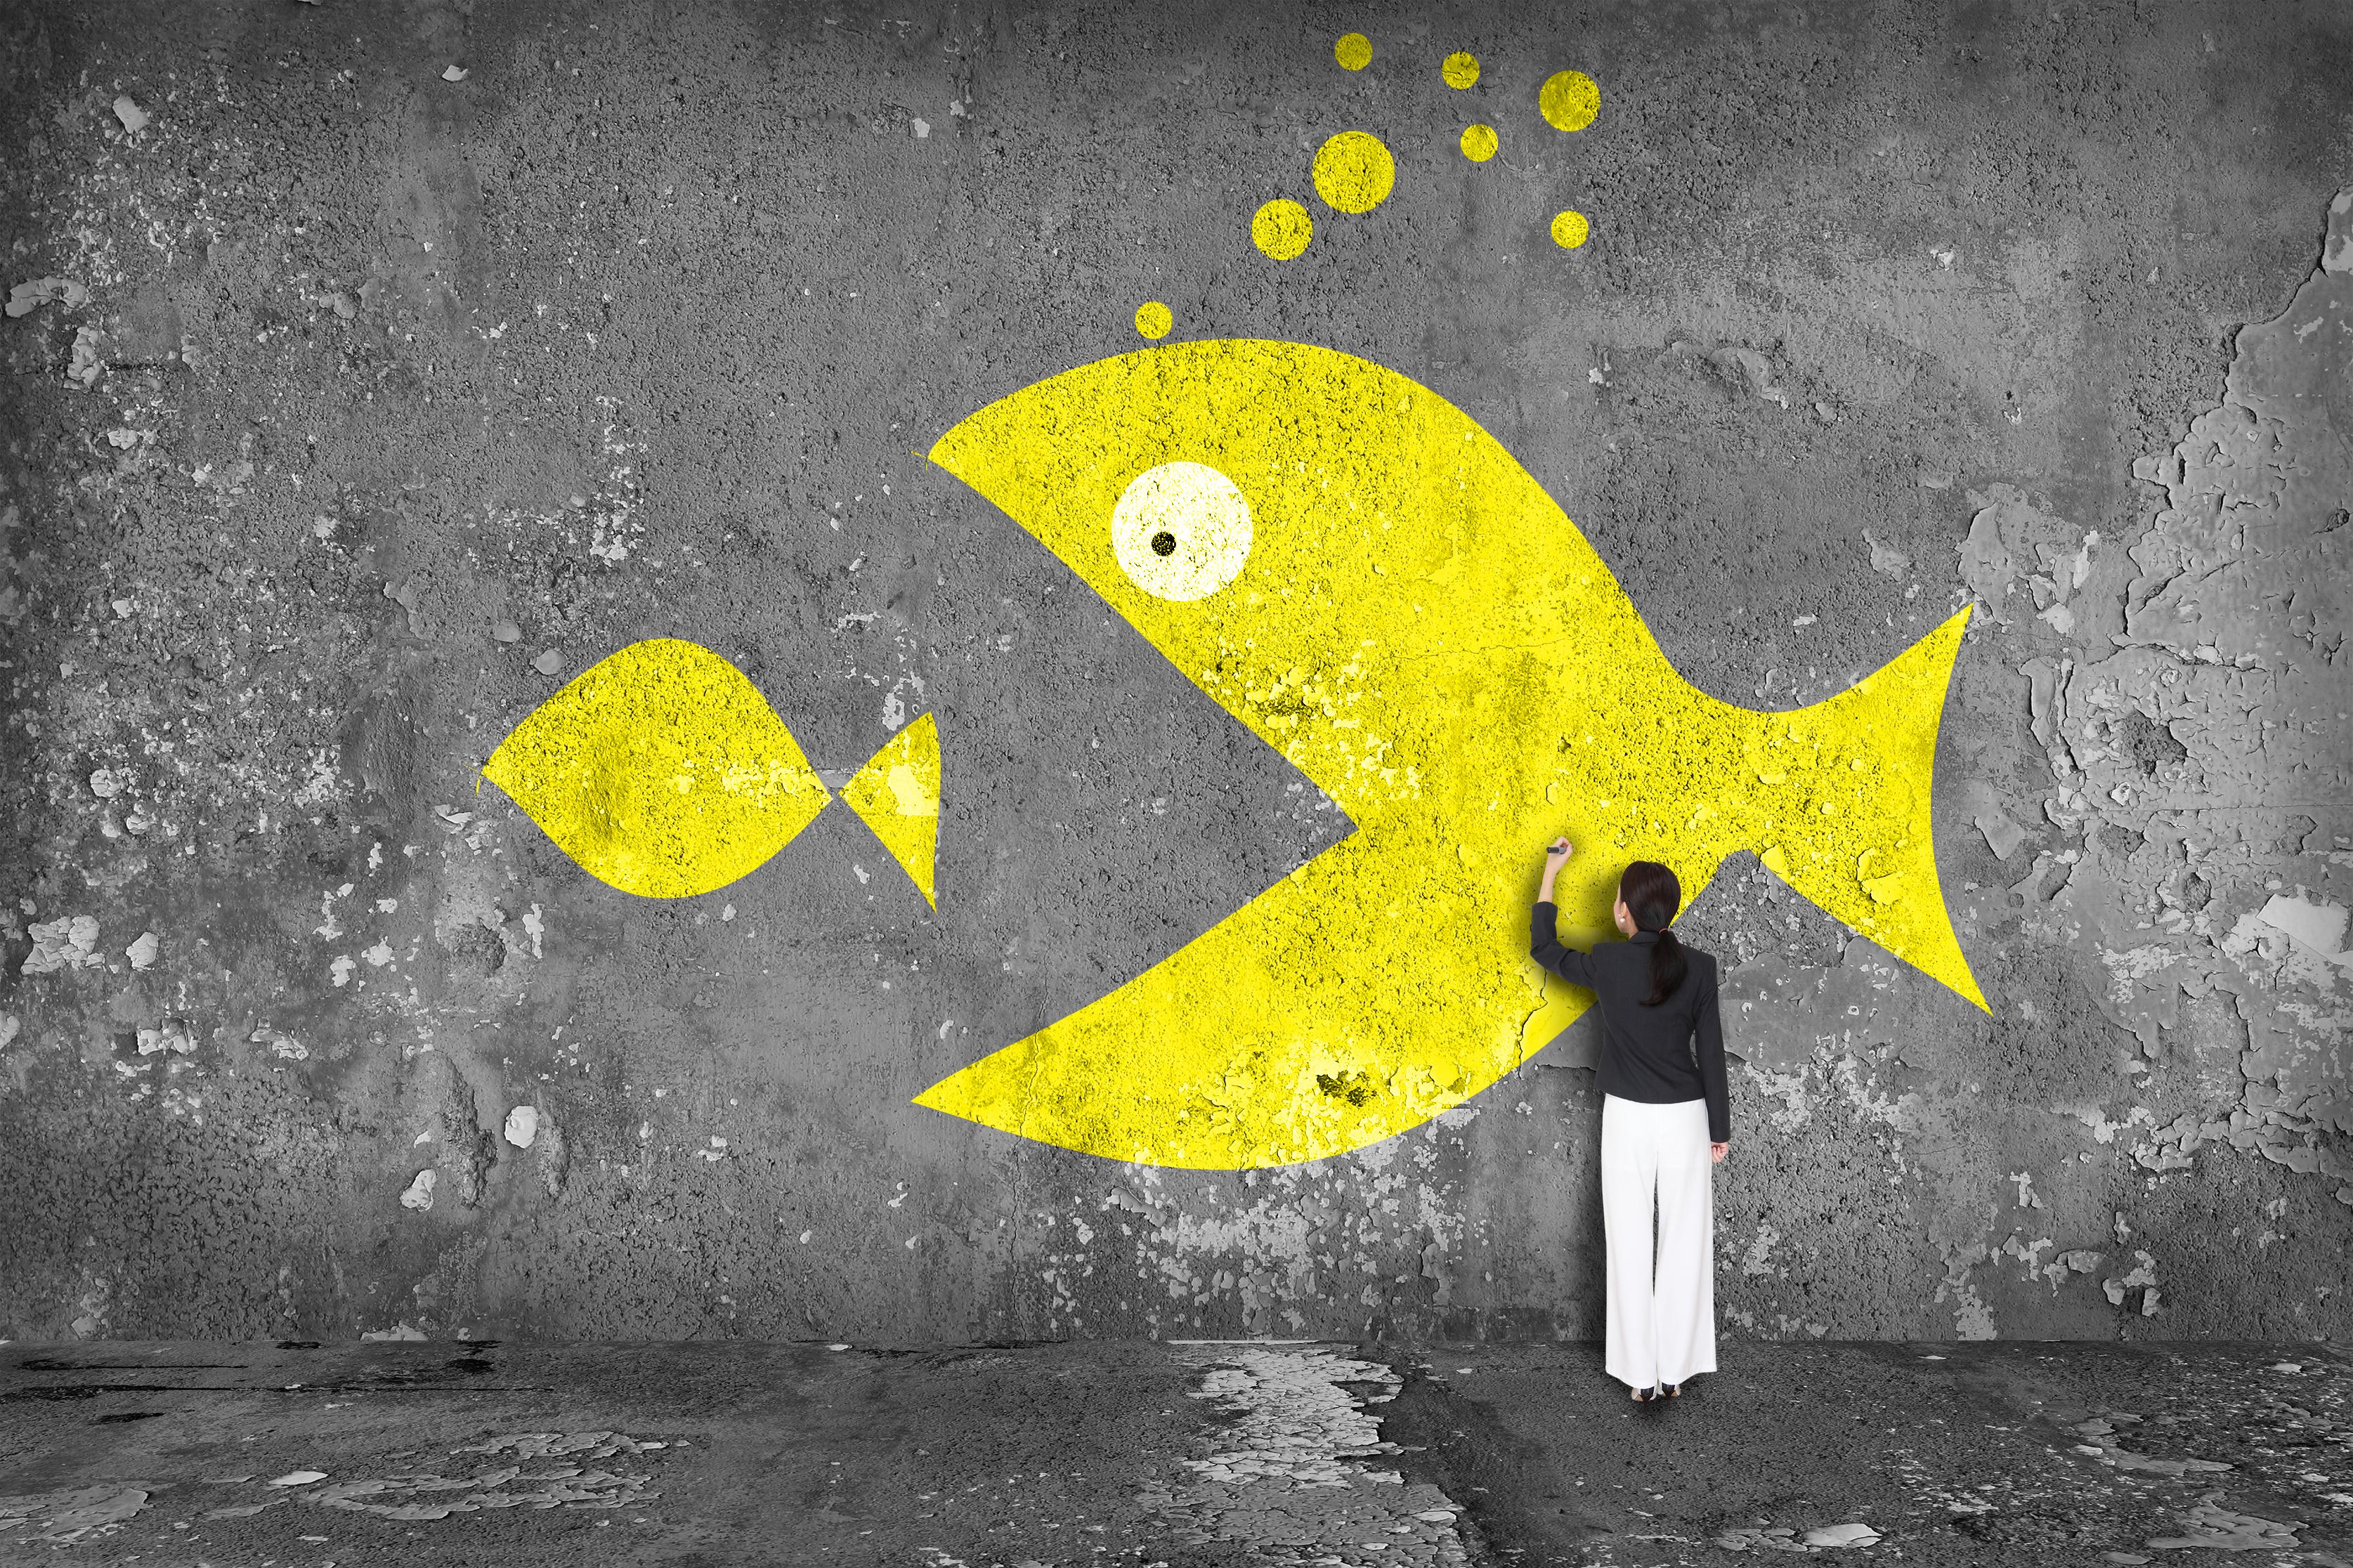 Painting of large yellow fish chasing small yellow fish